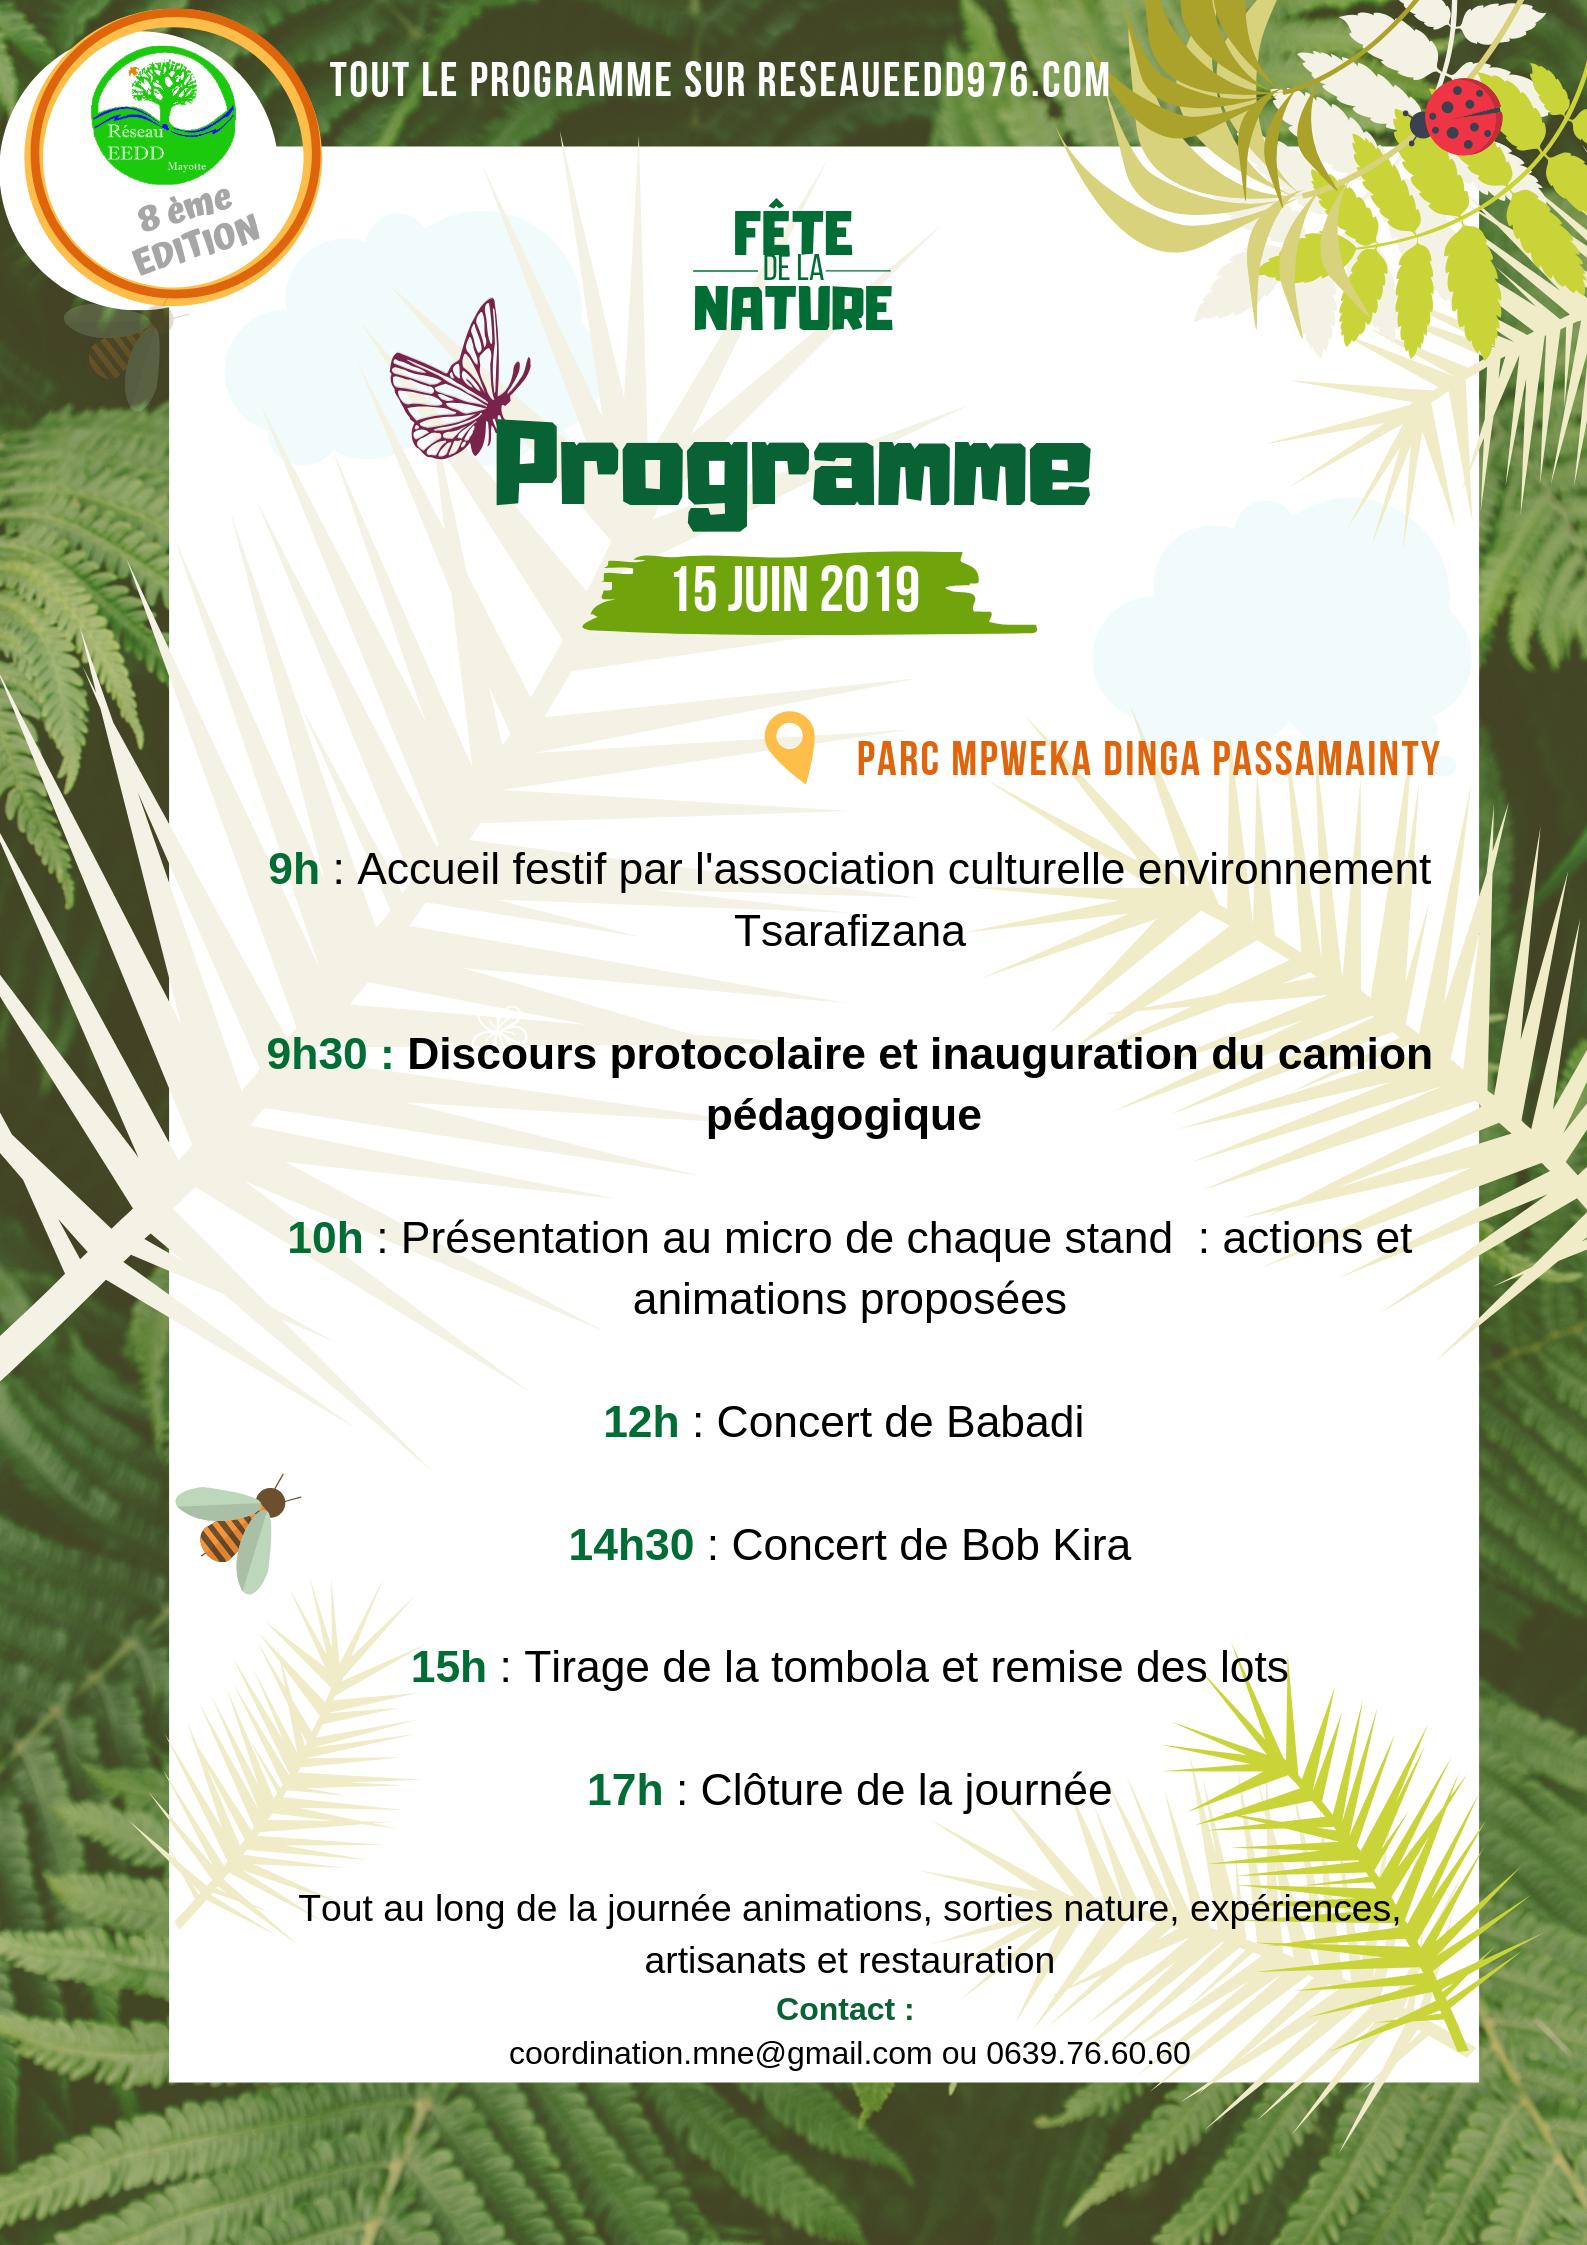 FDLN 2019 - programme prévisionnel VF.png